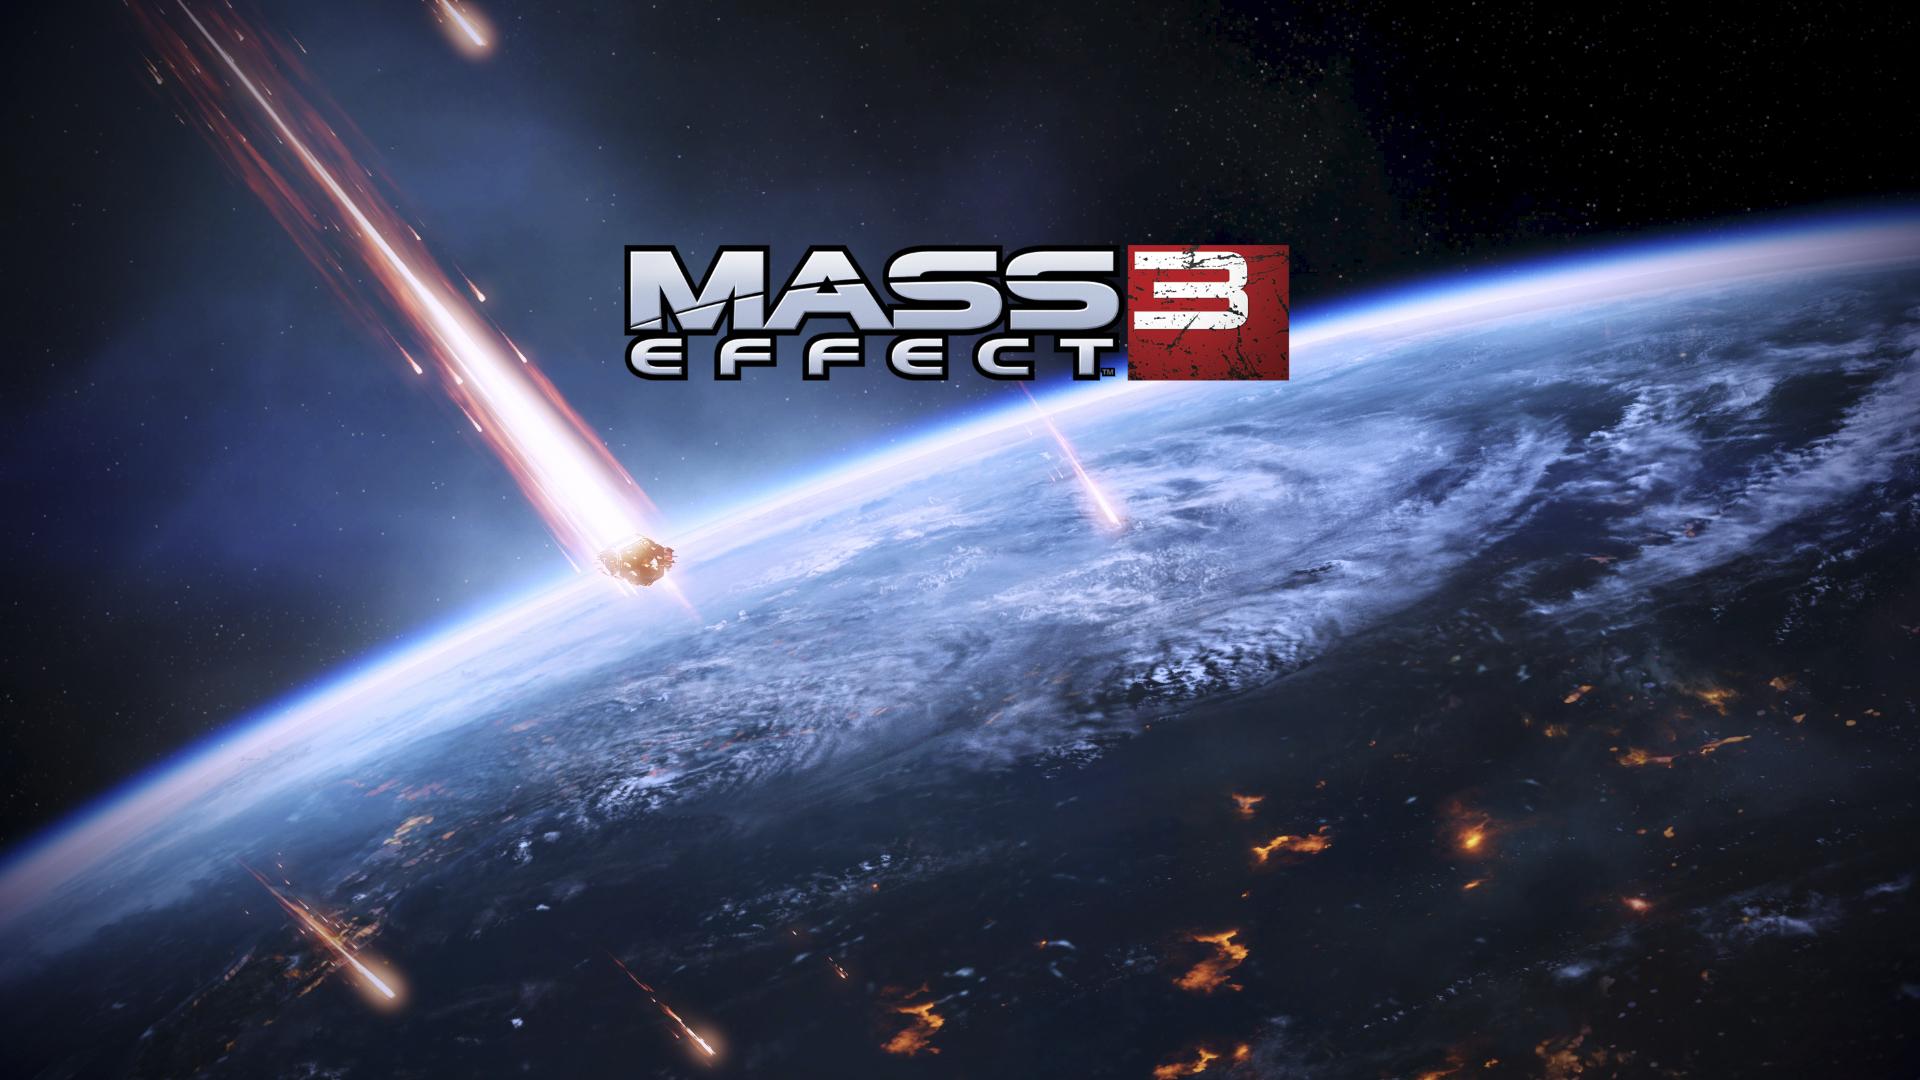 Love Effect Wallpaper : Mass Effect 3 Title Wallpaper by BlackScarletLove on ...